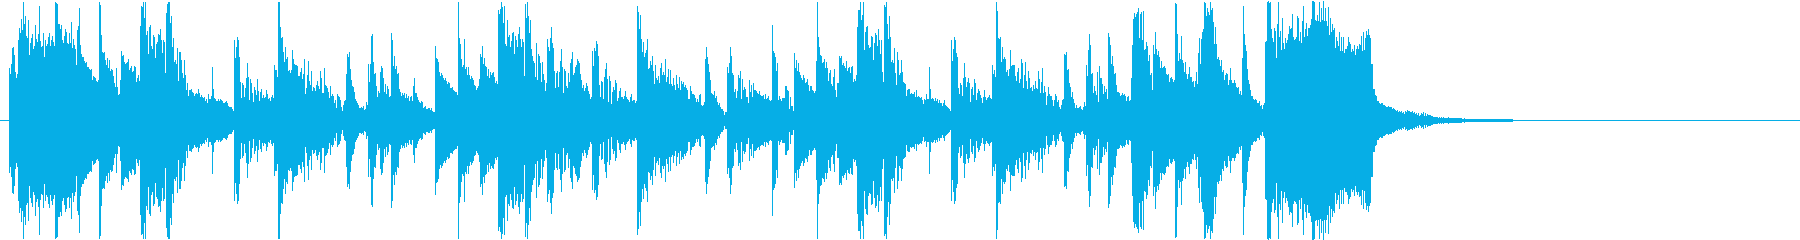 【DJ効果音】始まったばかりの再生済みの波形